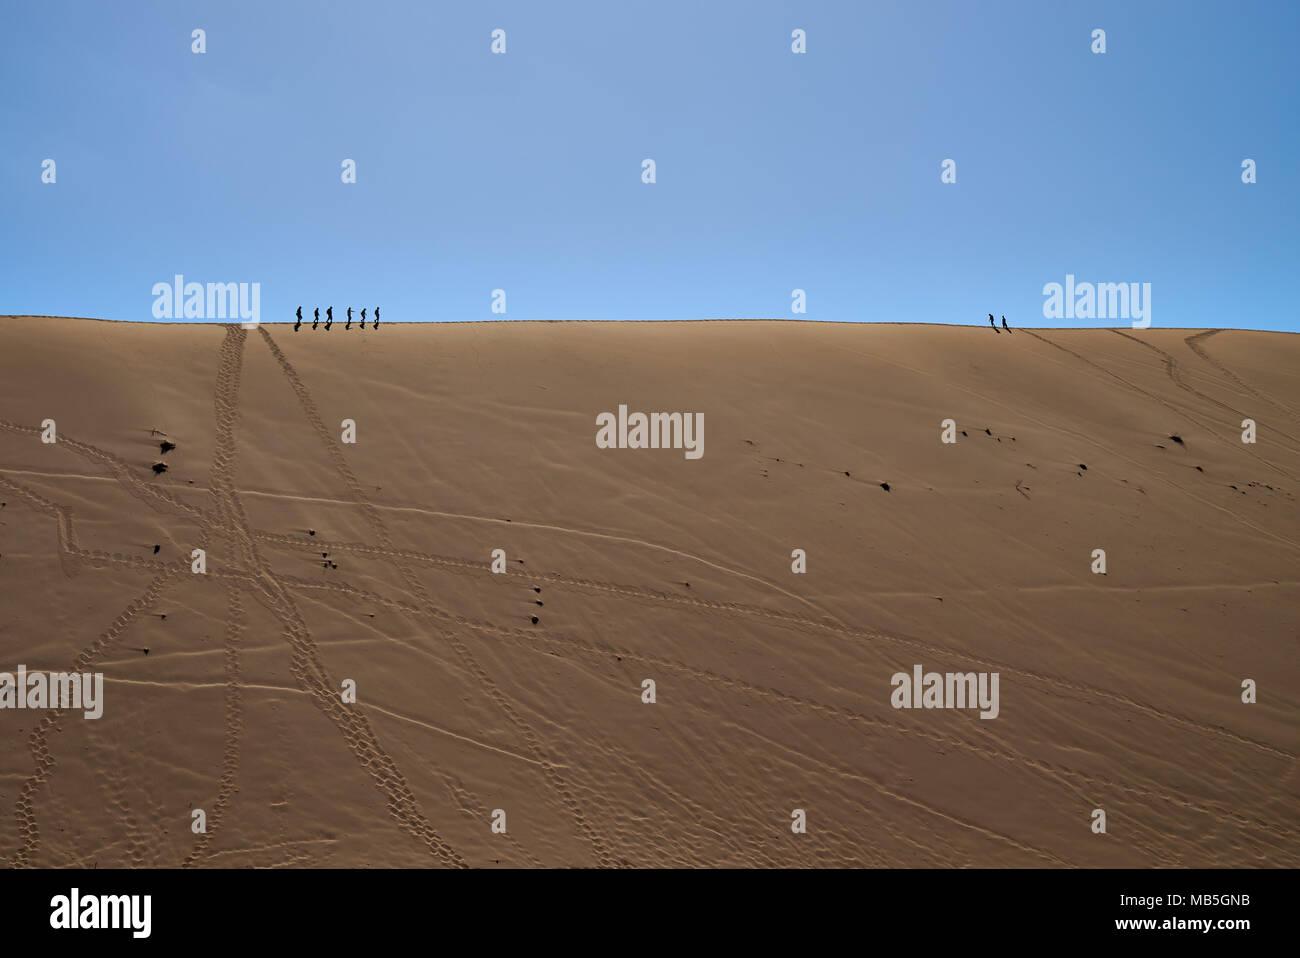 tourist walking on dune crest in desert landscape of Namib at Dead Vlei, Namib-Naukluft National Park, Namibia, Africa - Stock Image